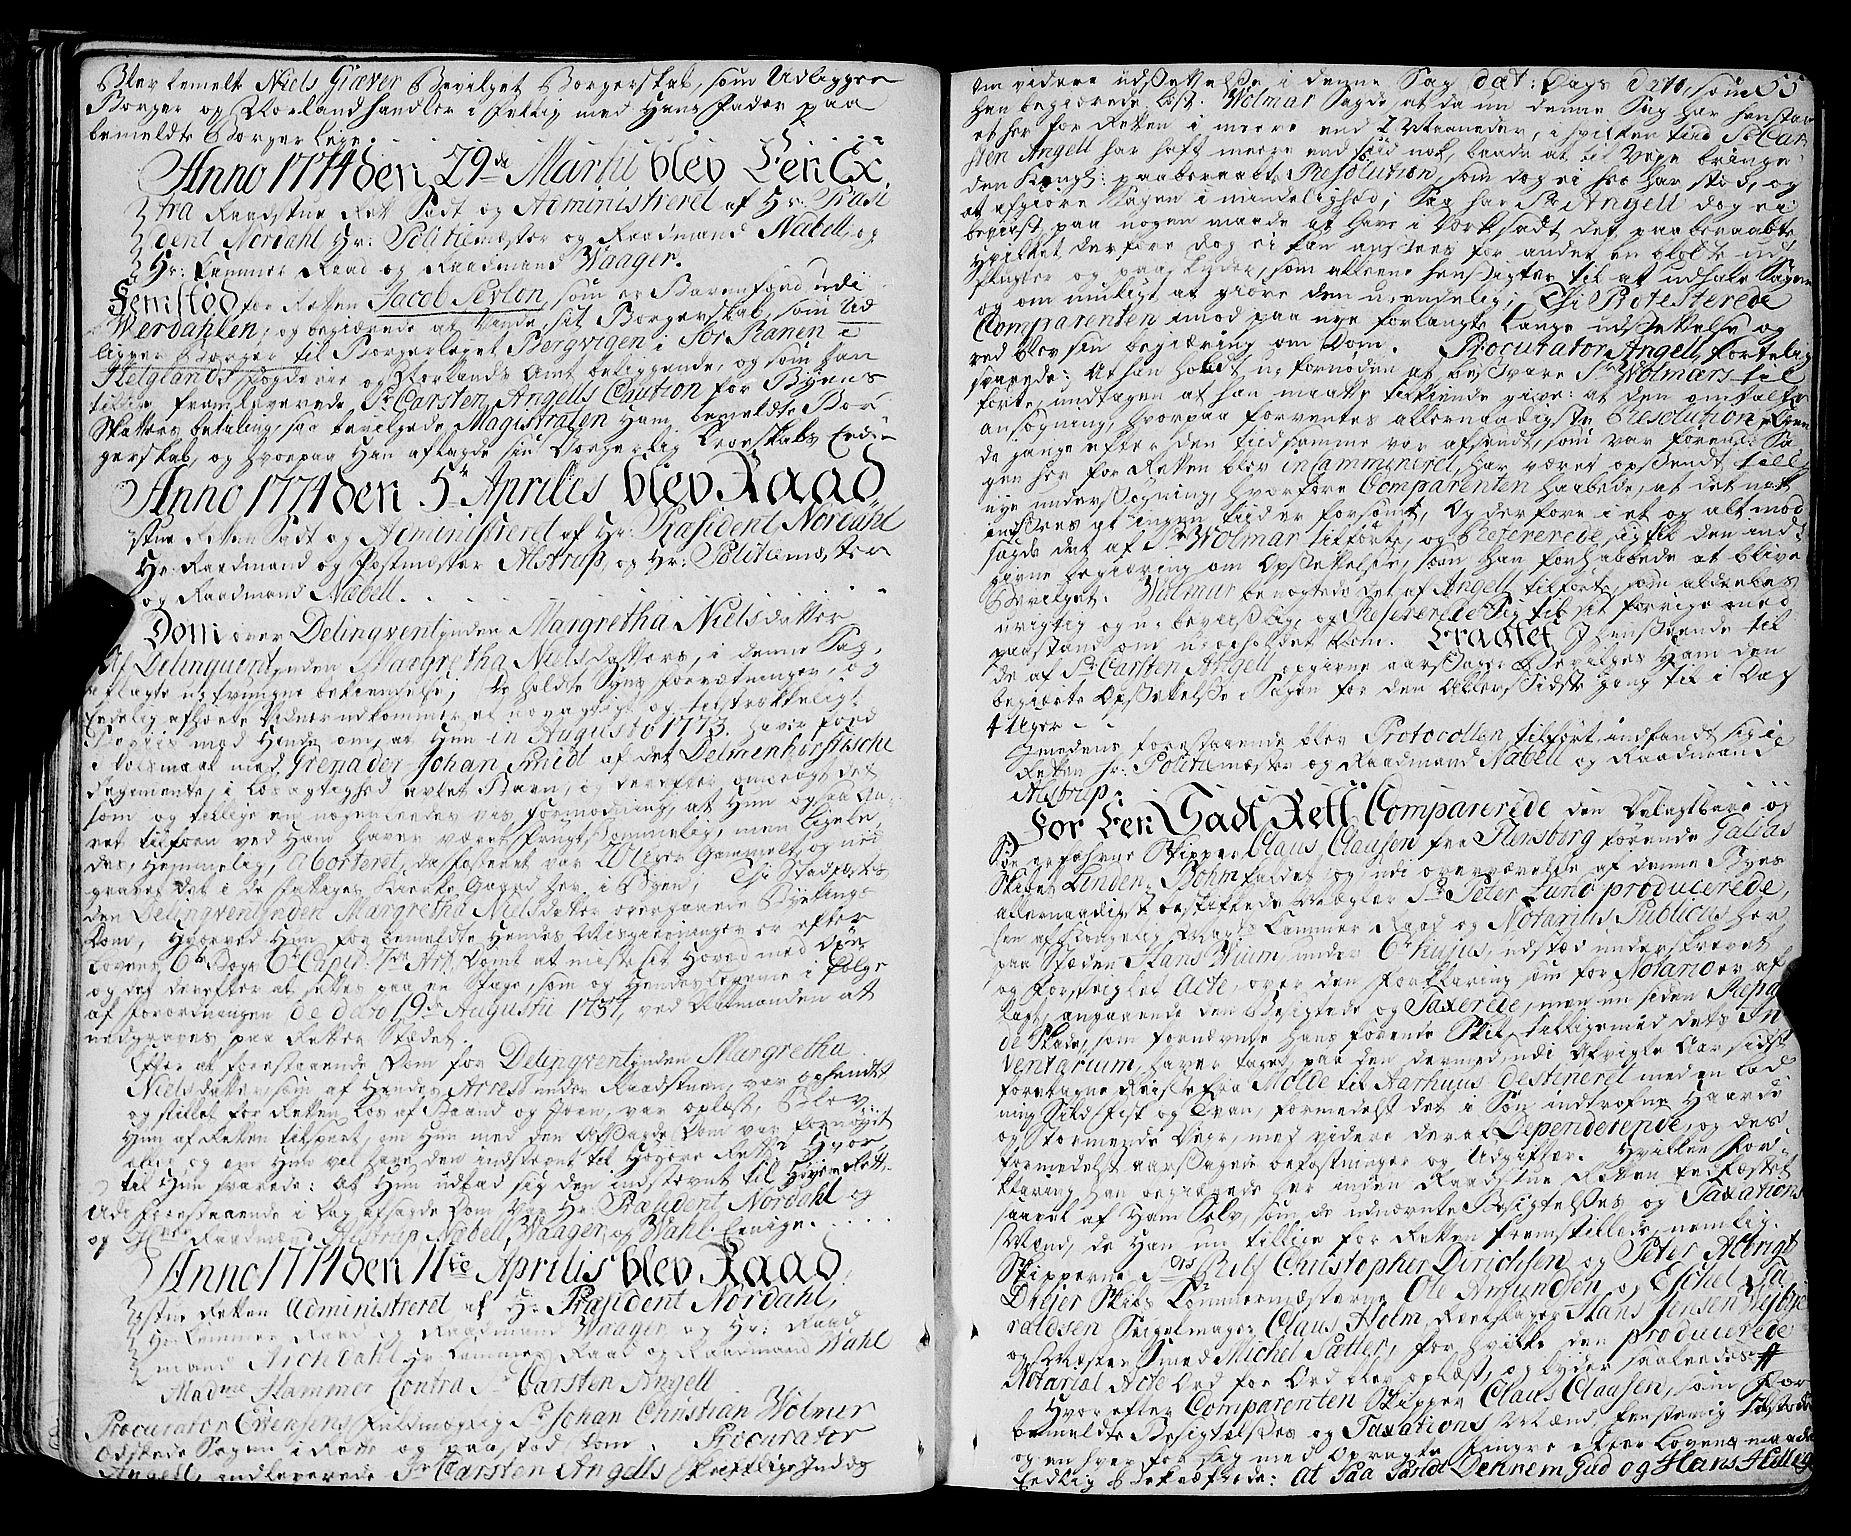 SAT, Trondheim magistrat, A/Aa/L0017: Rådstueprotokoller, 1772-1793, s. 55